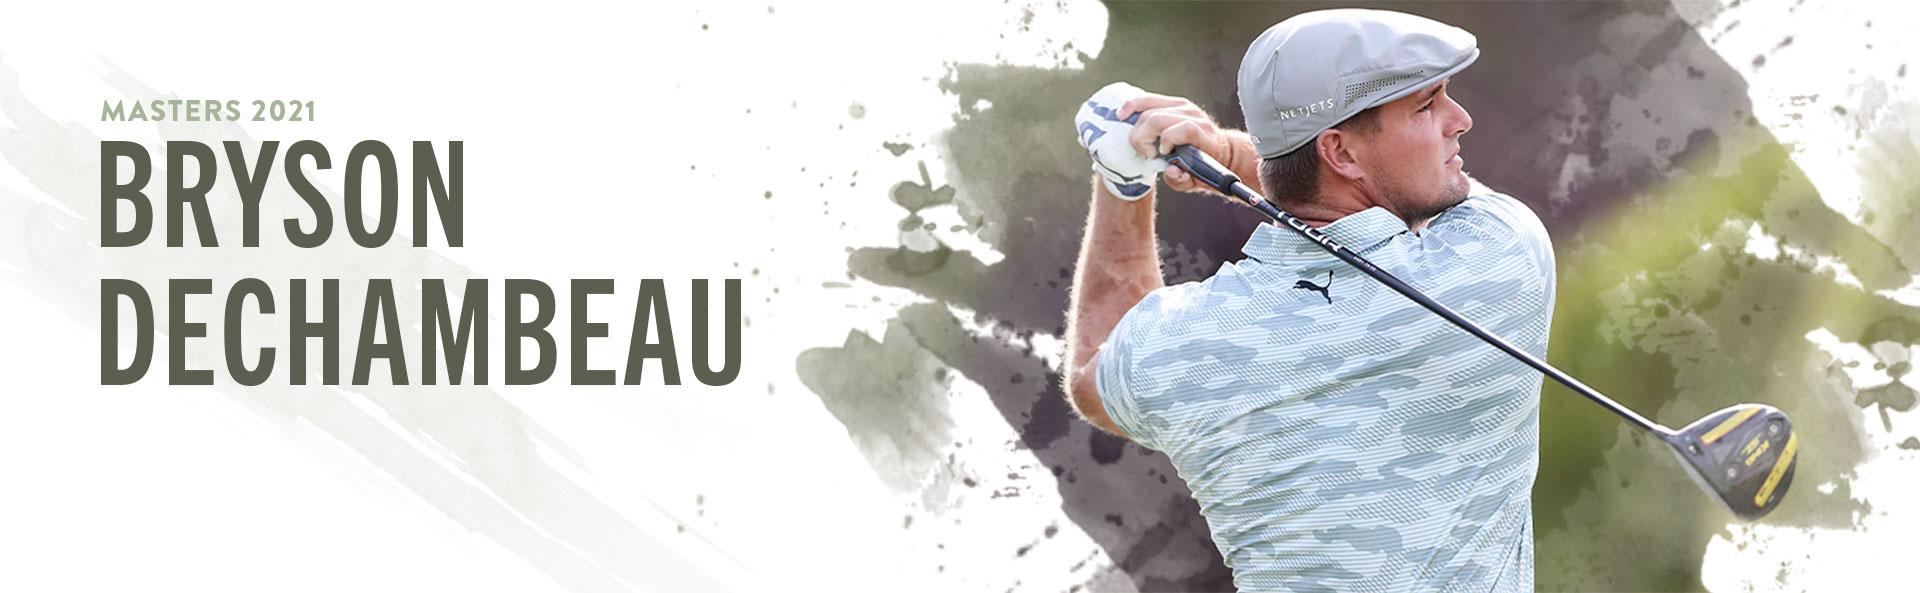 US Masters 2021 - Tournament Predictions - GolfBox